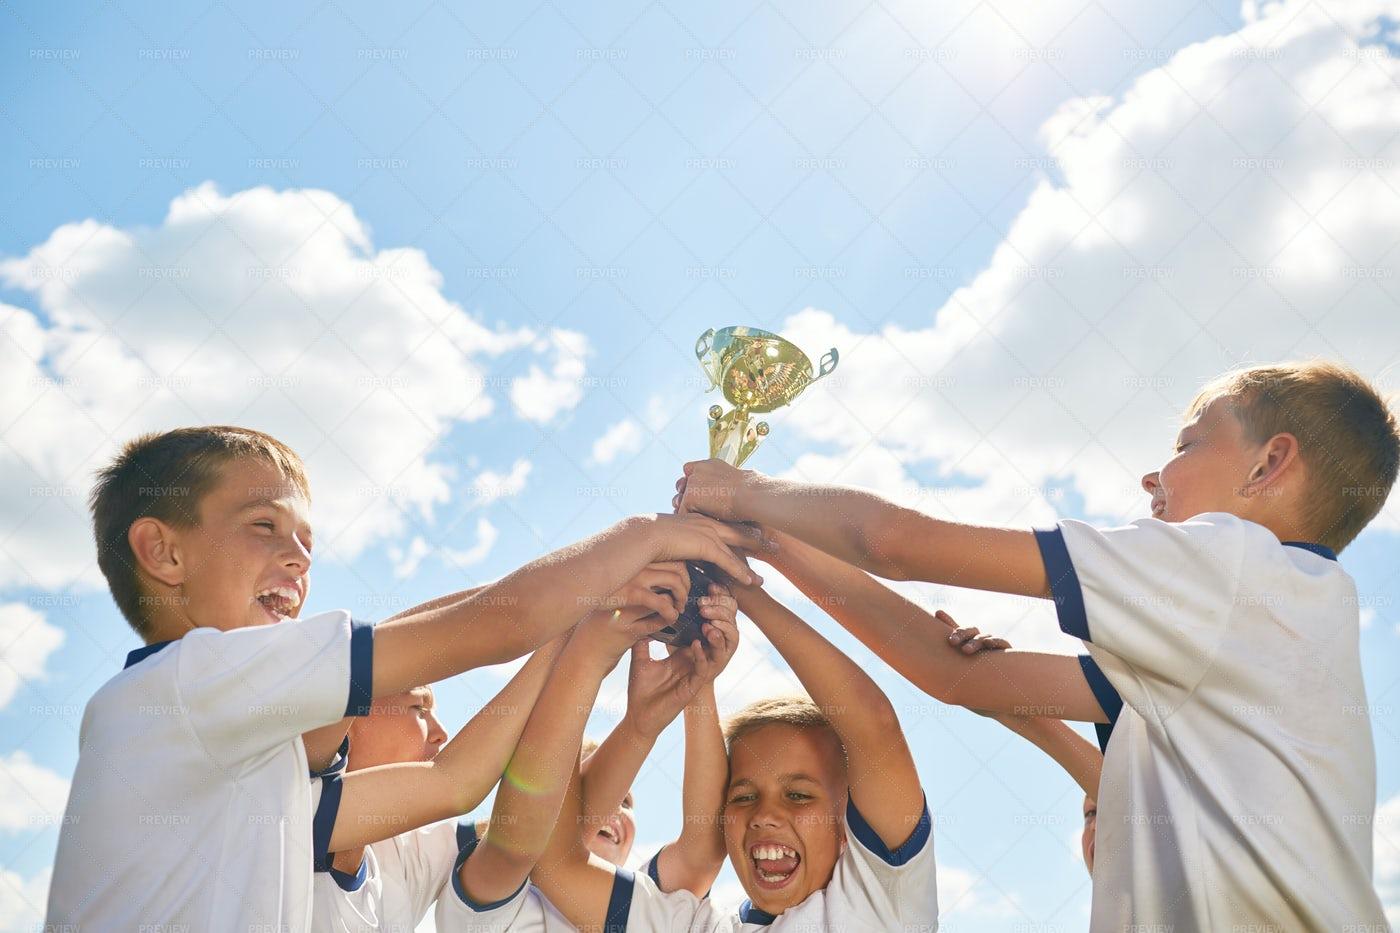 Boys Sports Team Holding Trophy: Stock Photos